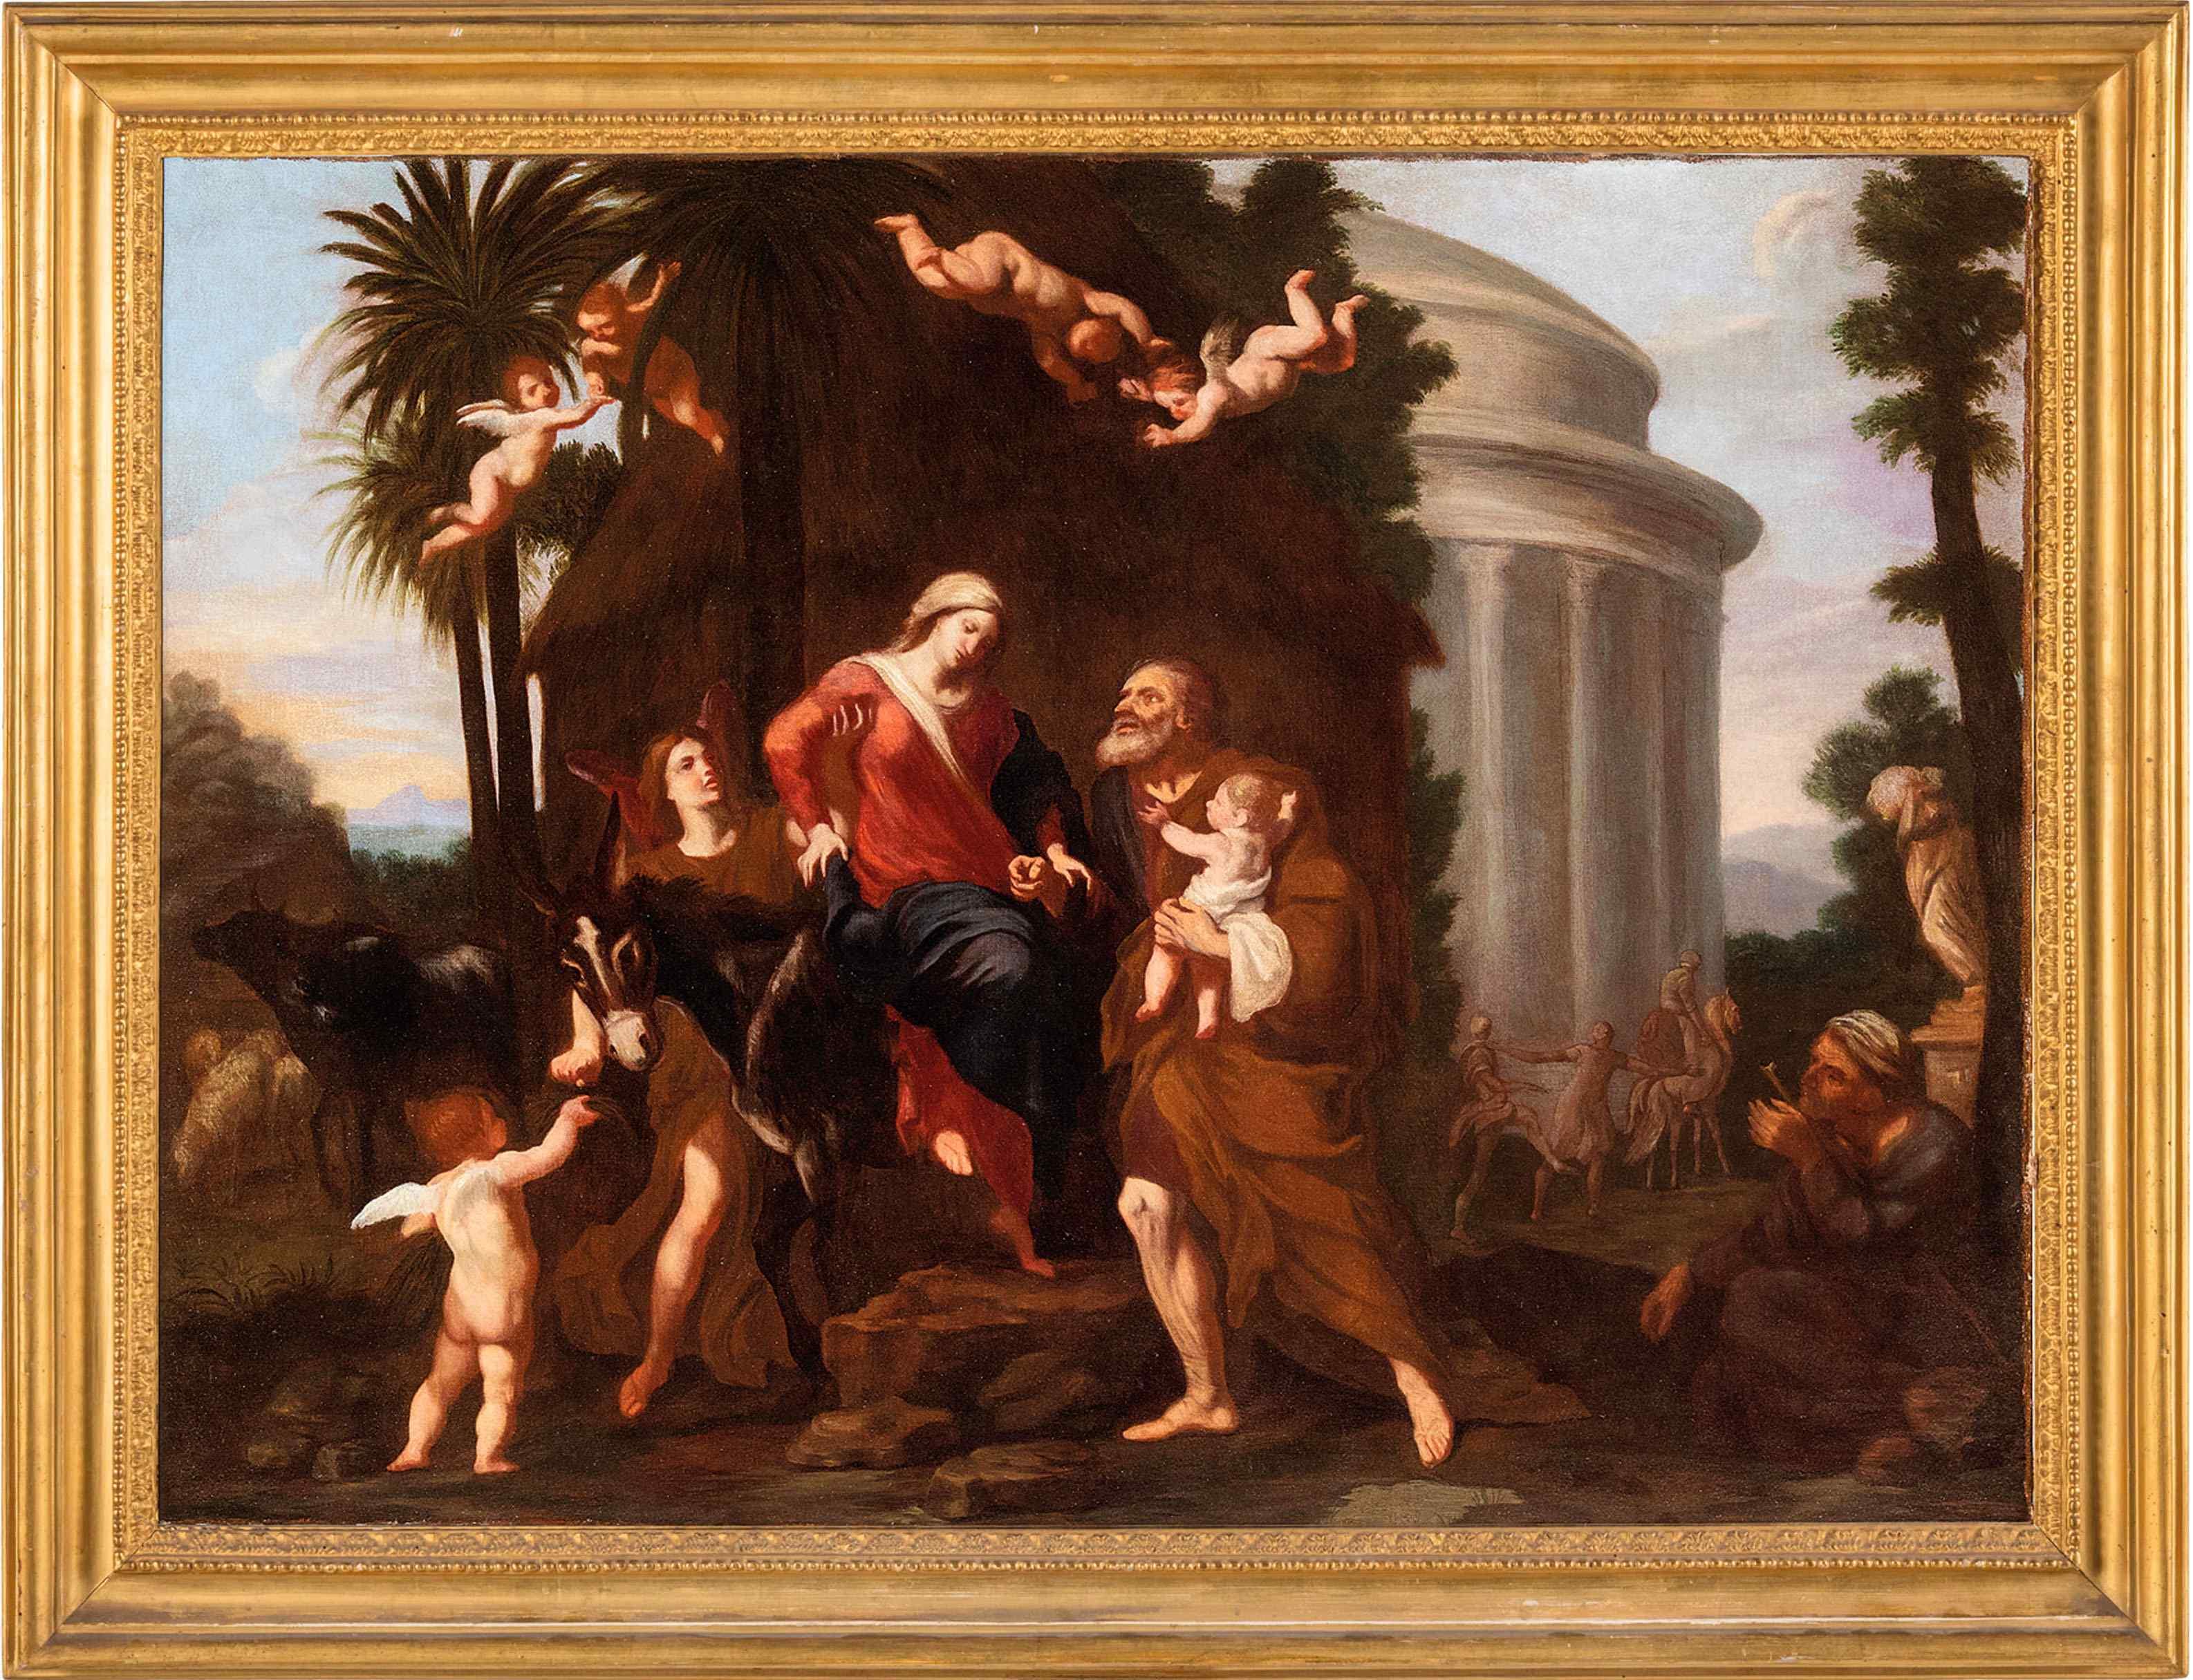 Giuseppe Passeri (Roma, 1654 - Roma, 1714)